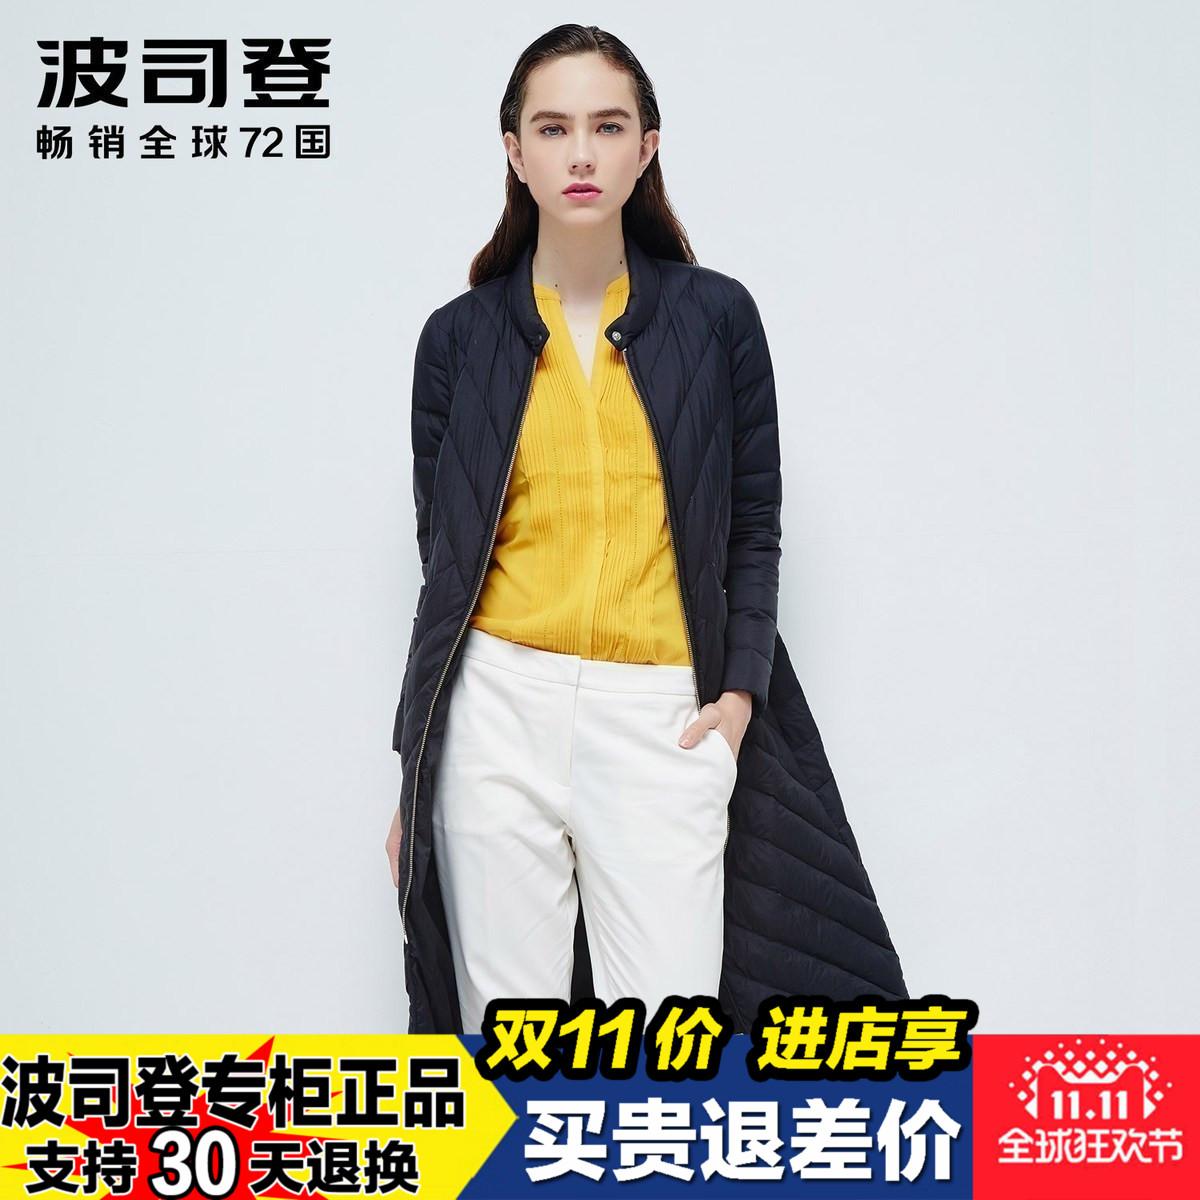 BSD专柜同款波司登秋羽绒服正品 轻薄鹅绒潮立领女超长款B1601072